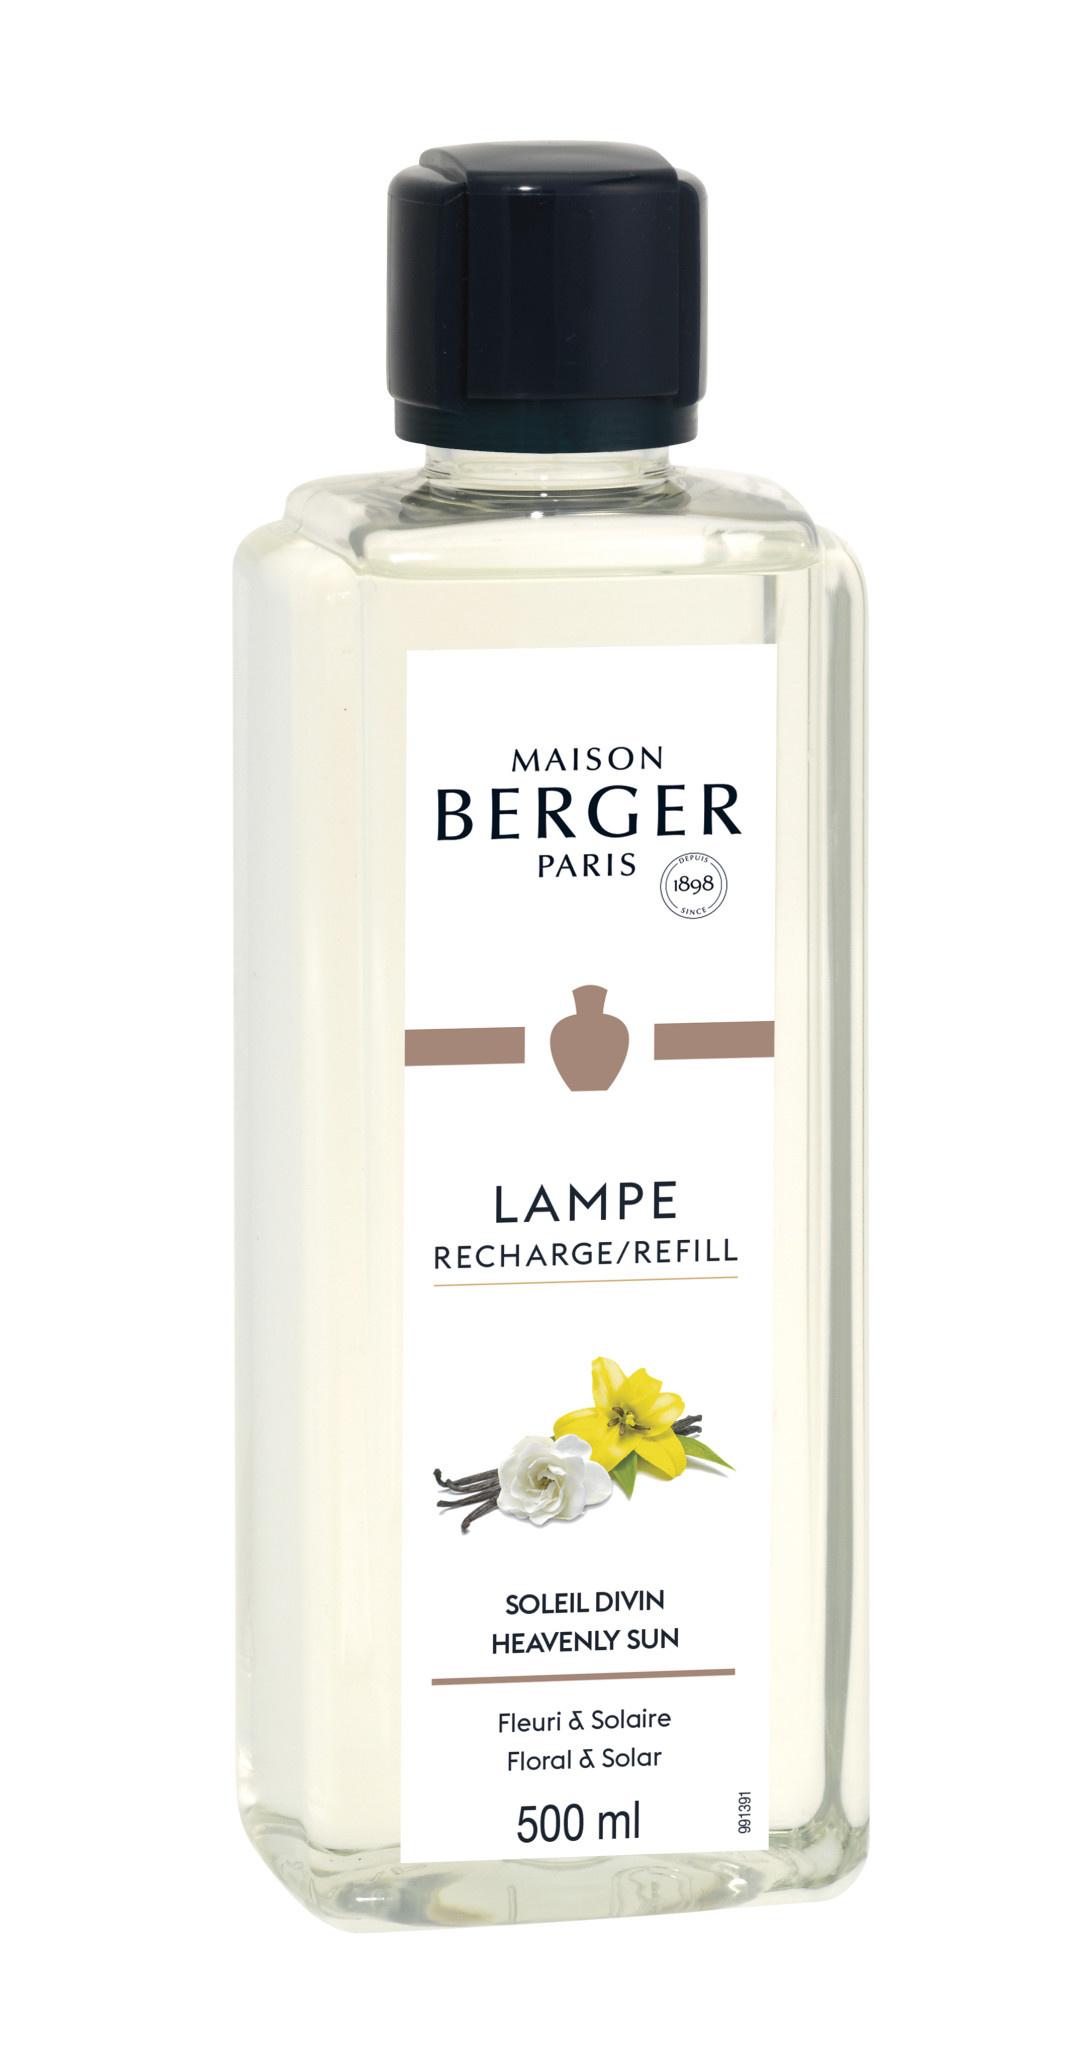 Maison Berger Soleil Divin 500 ml